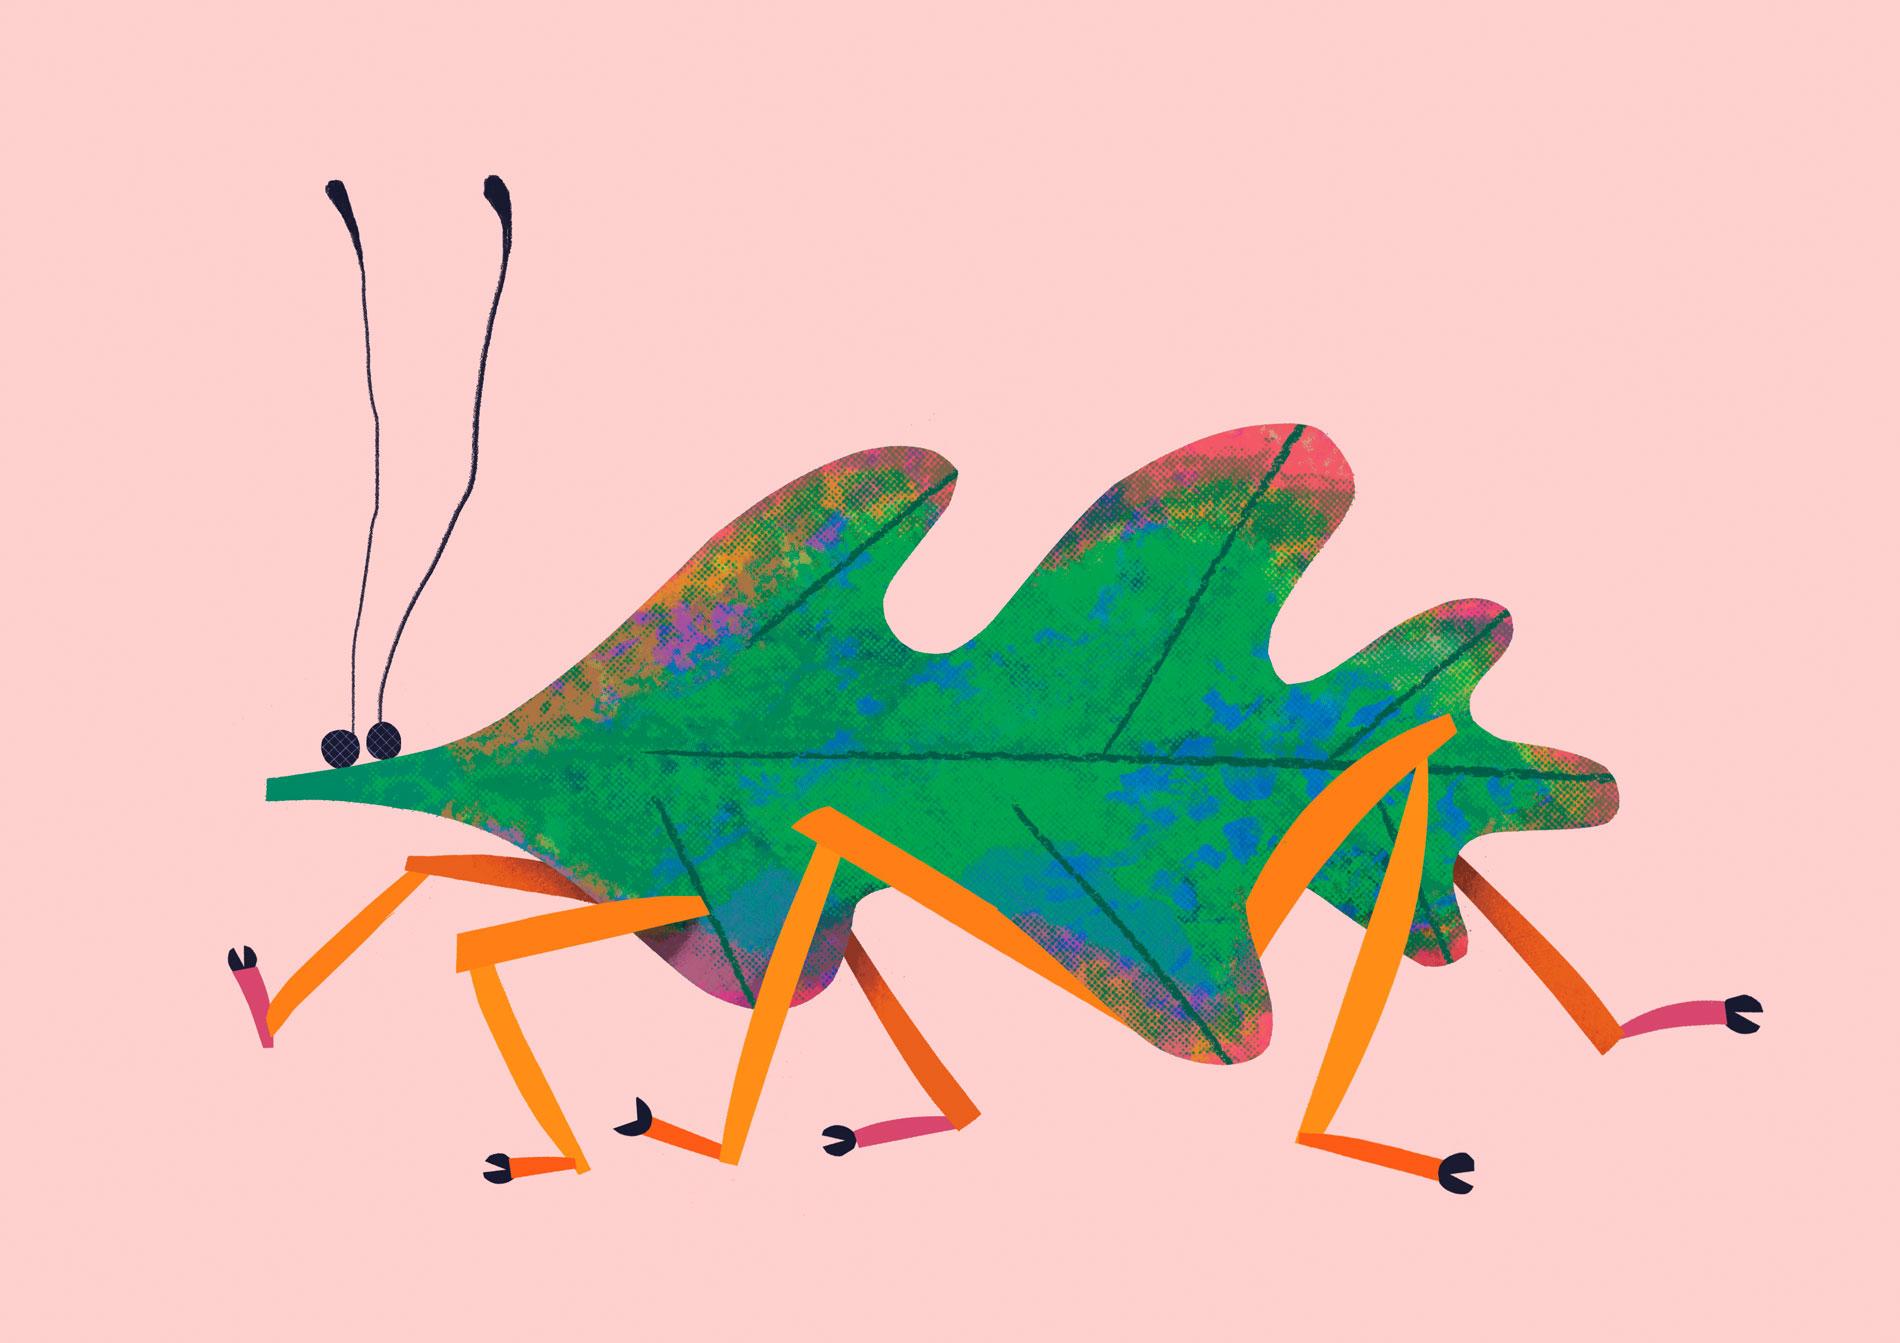 leaf-insect-by-Natasha-Durley.jpg